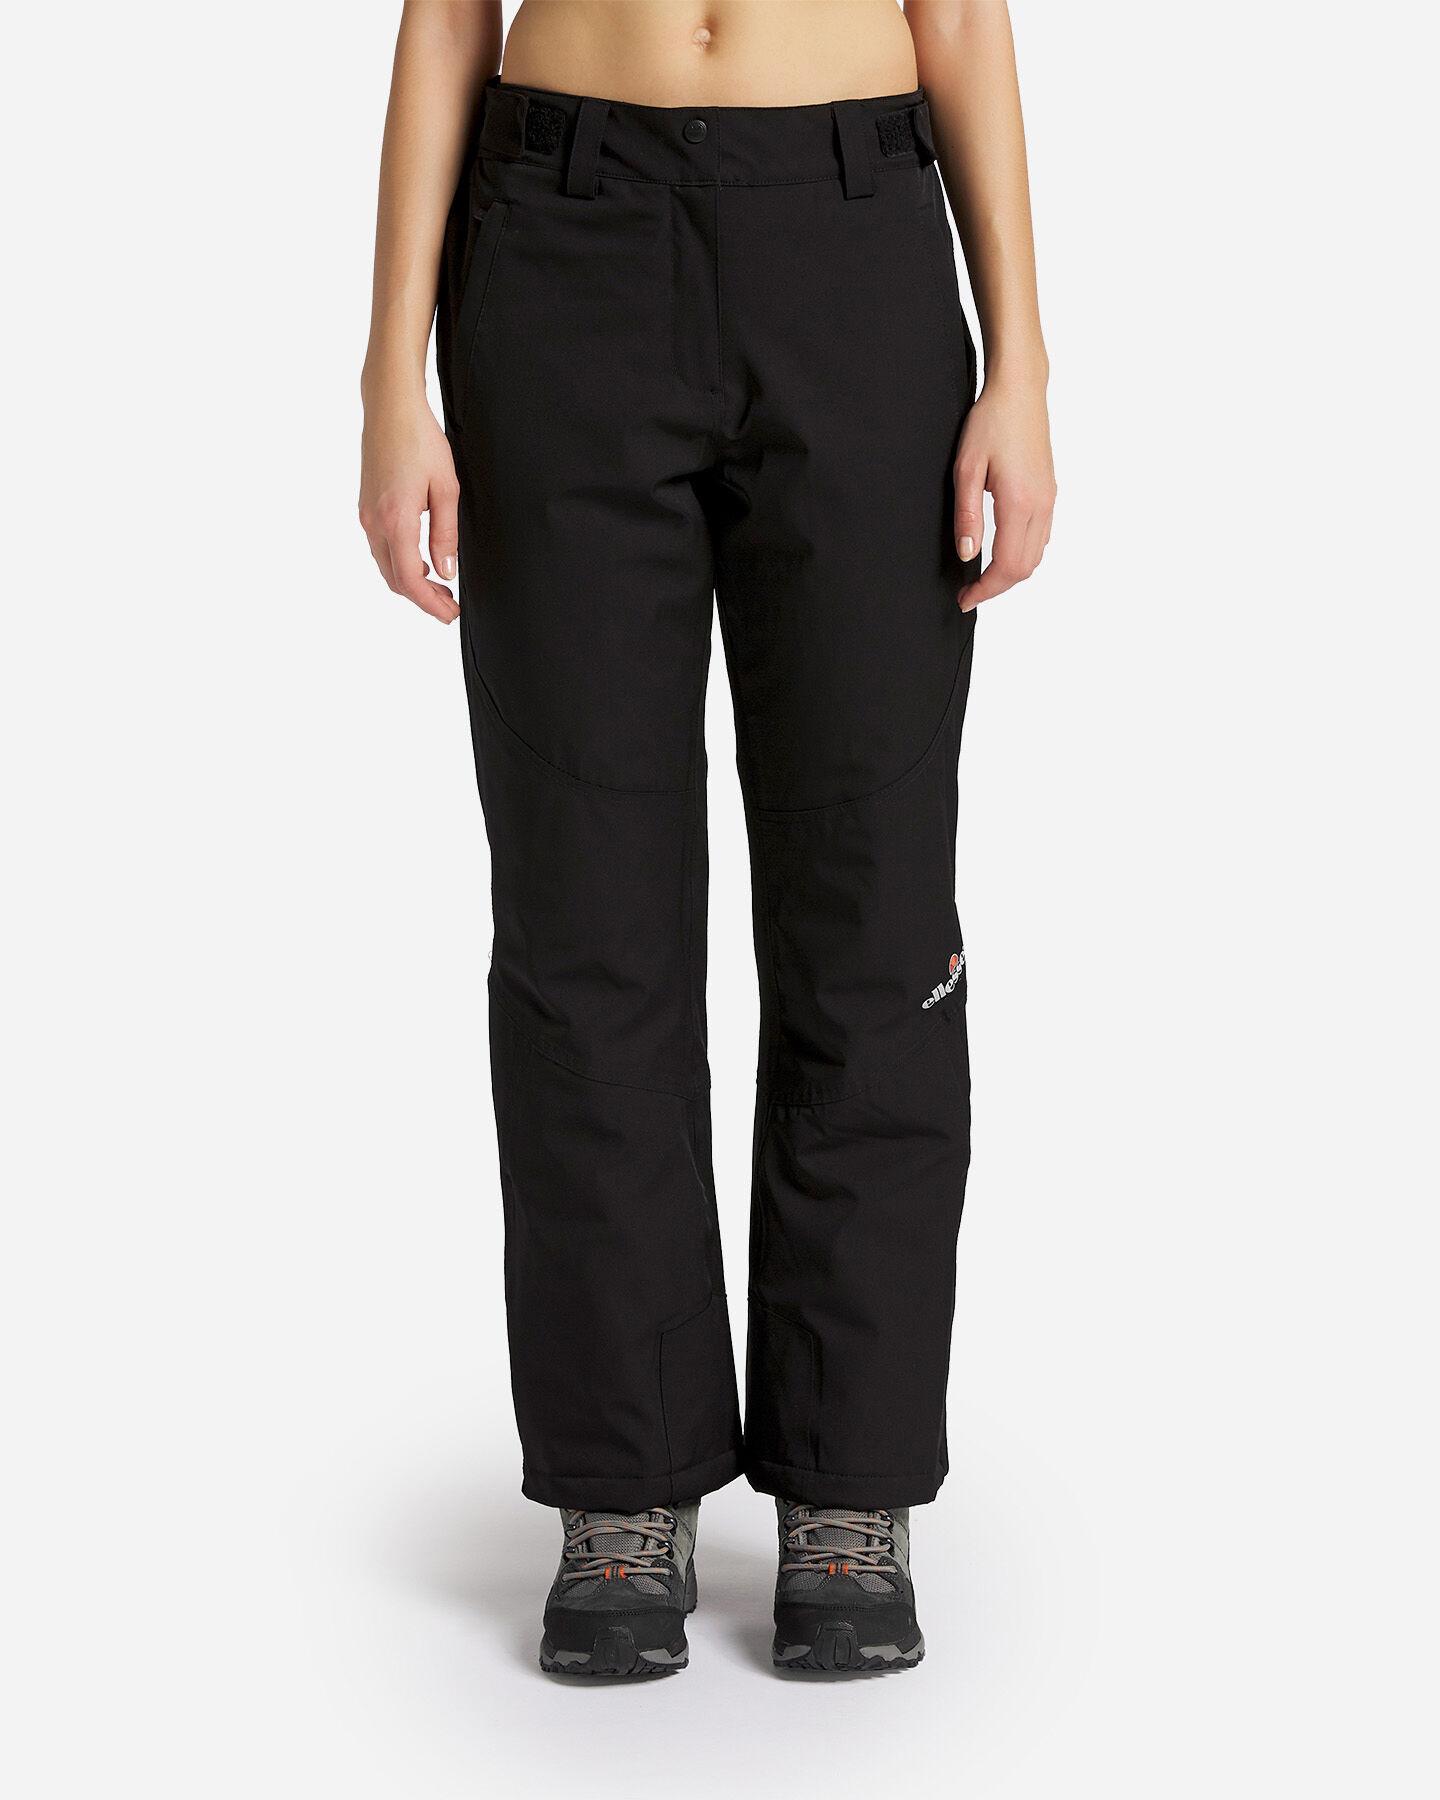 Pantalone sci ELLESSE SKI PANT W S4029977 scatto 0